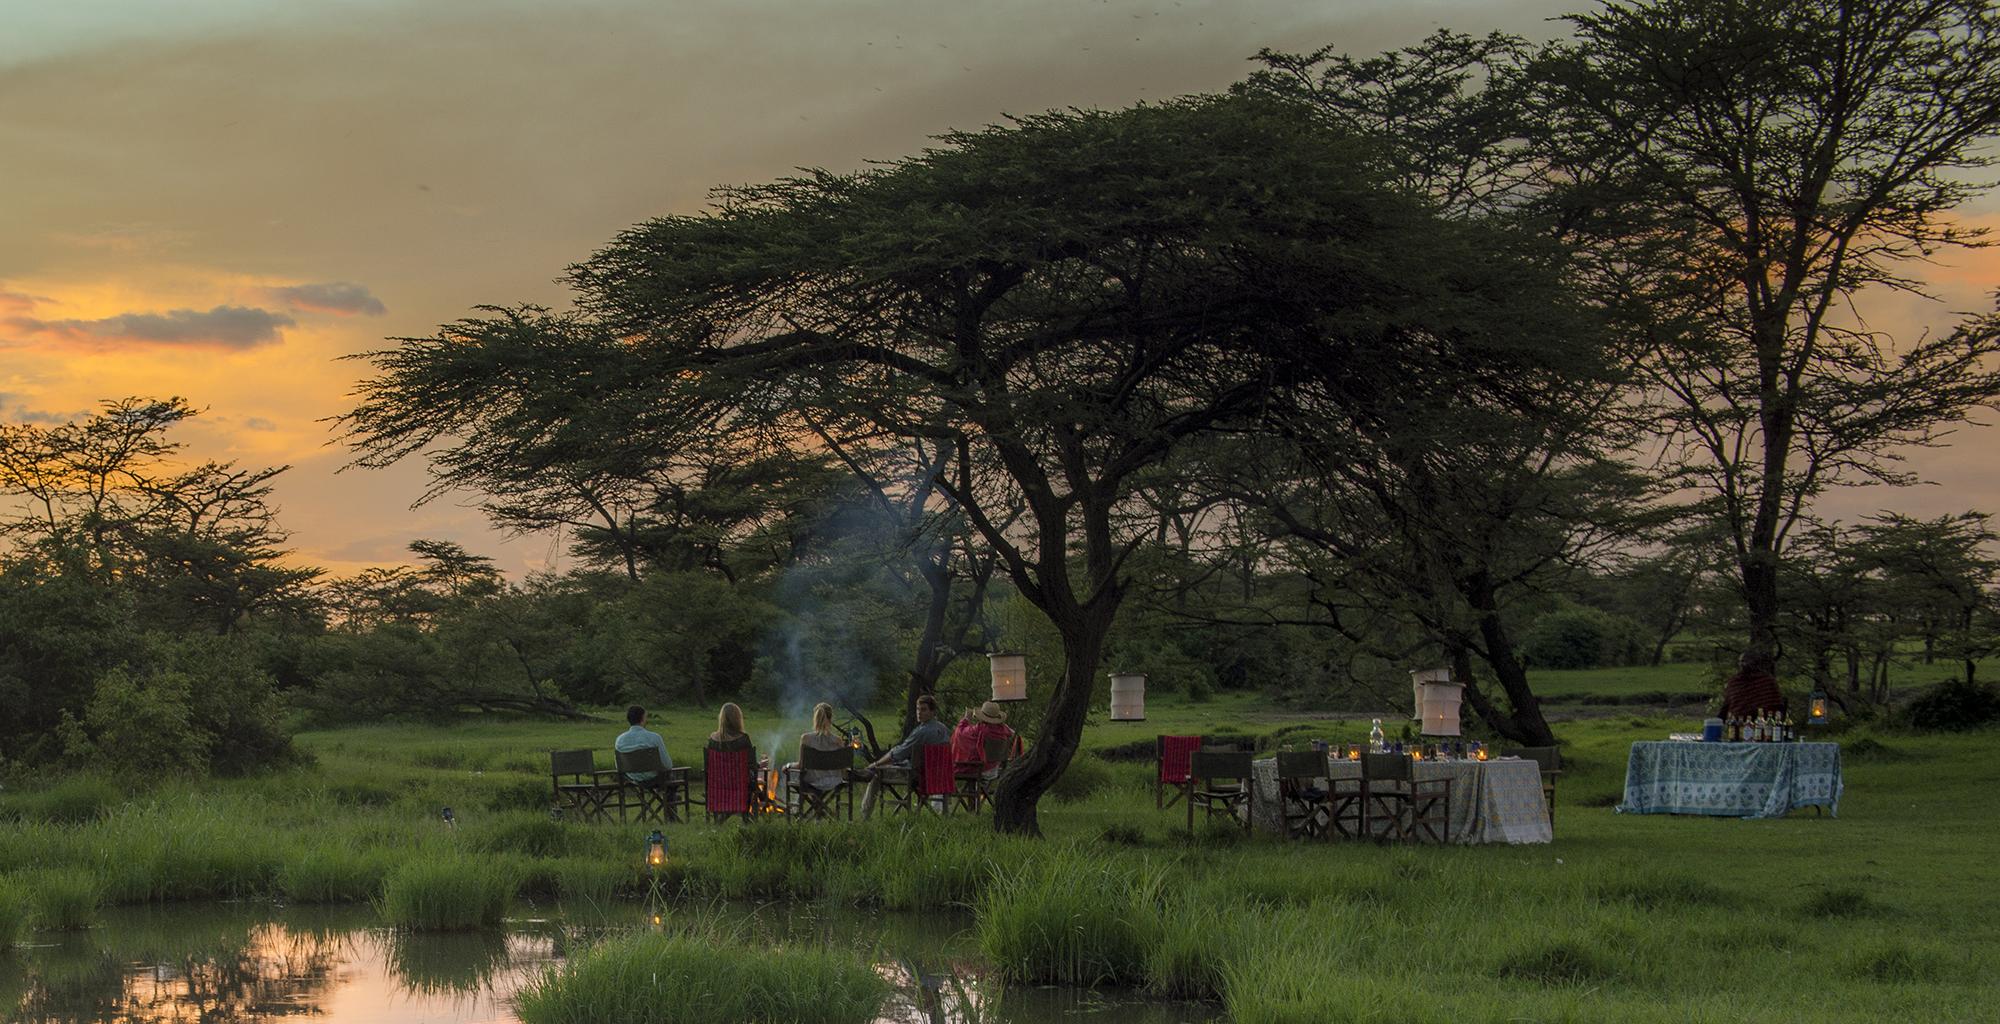 Kenya-Richard's-River-Camp-Campfire